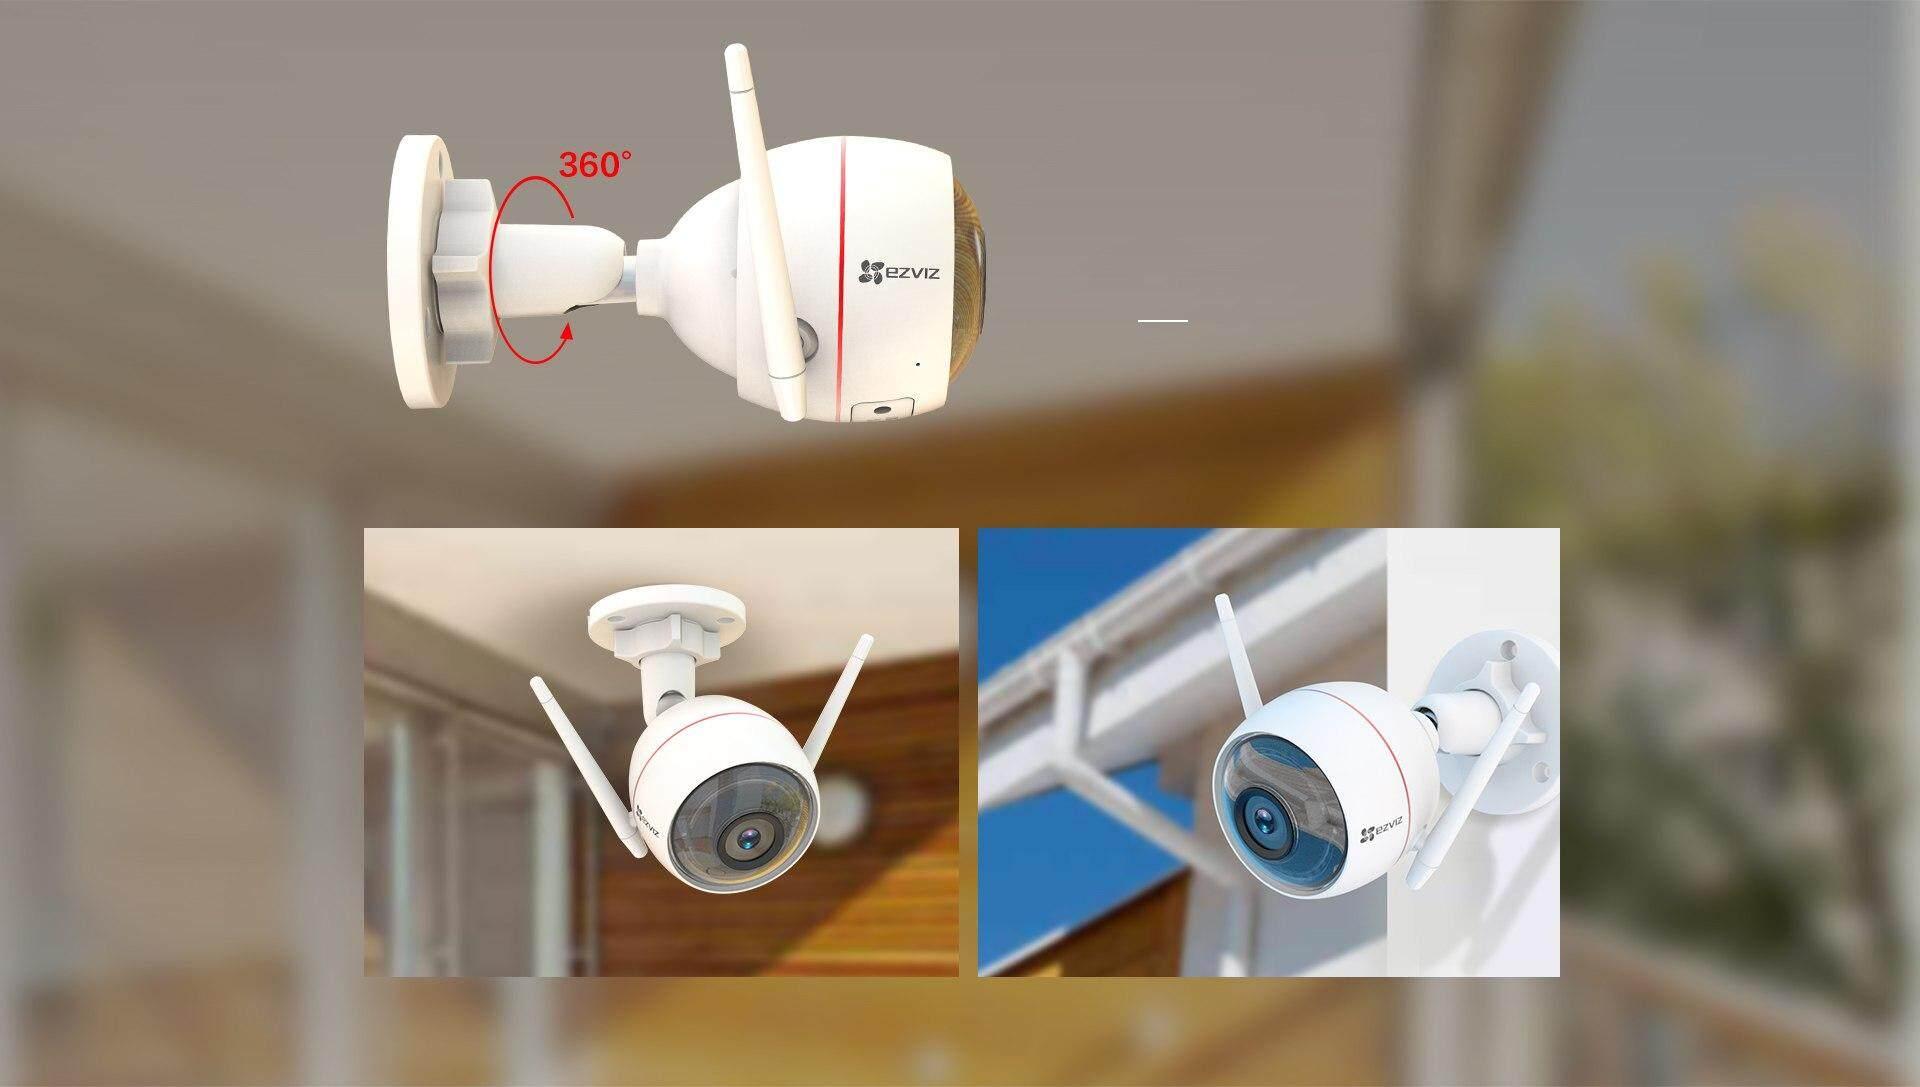 Ezviz-1MP-720P-Husky-Air-wall-mounted-Wi-Fi-camera-desc-img9.jpg